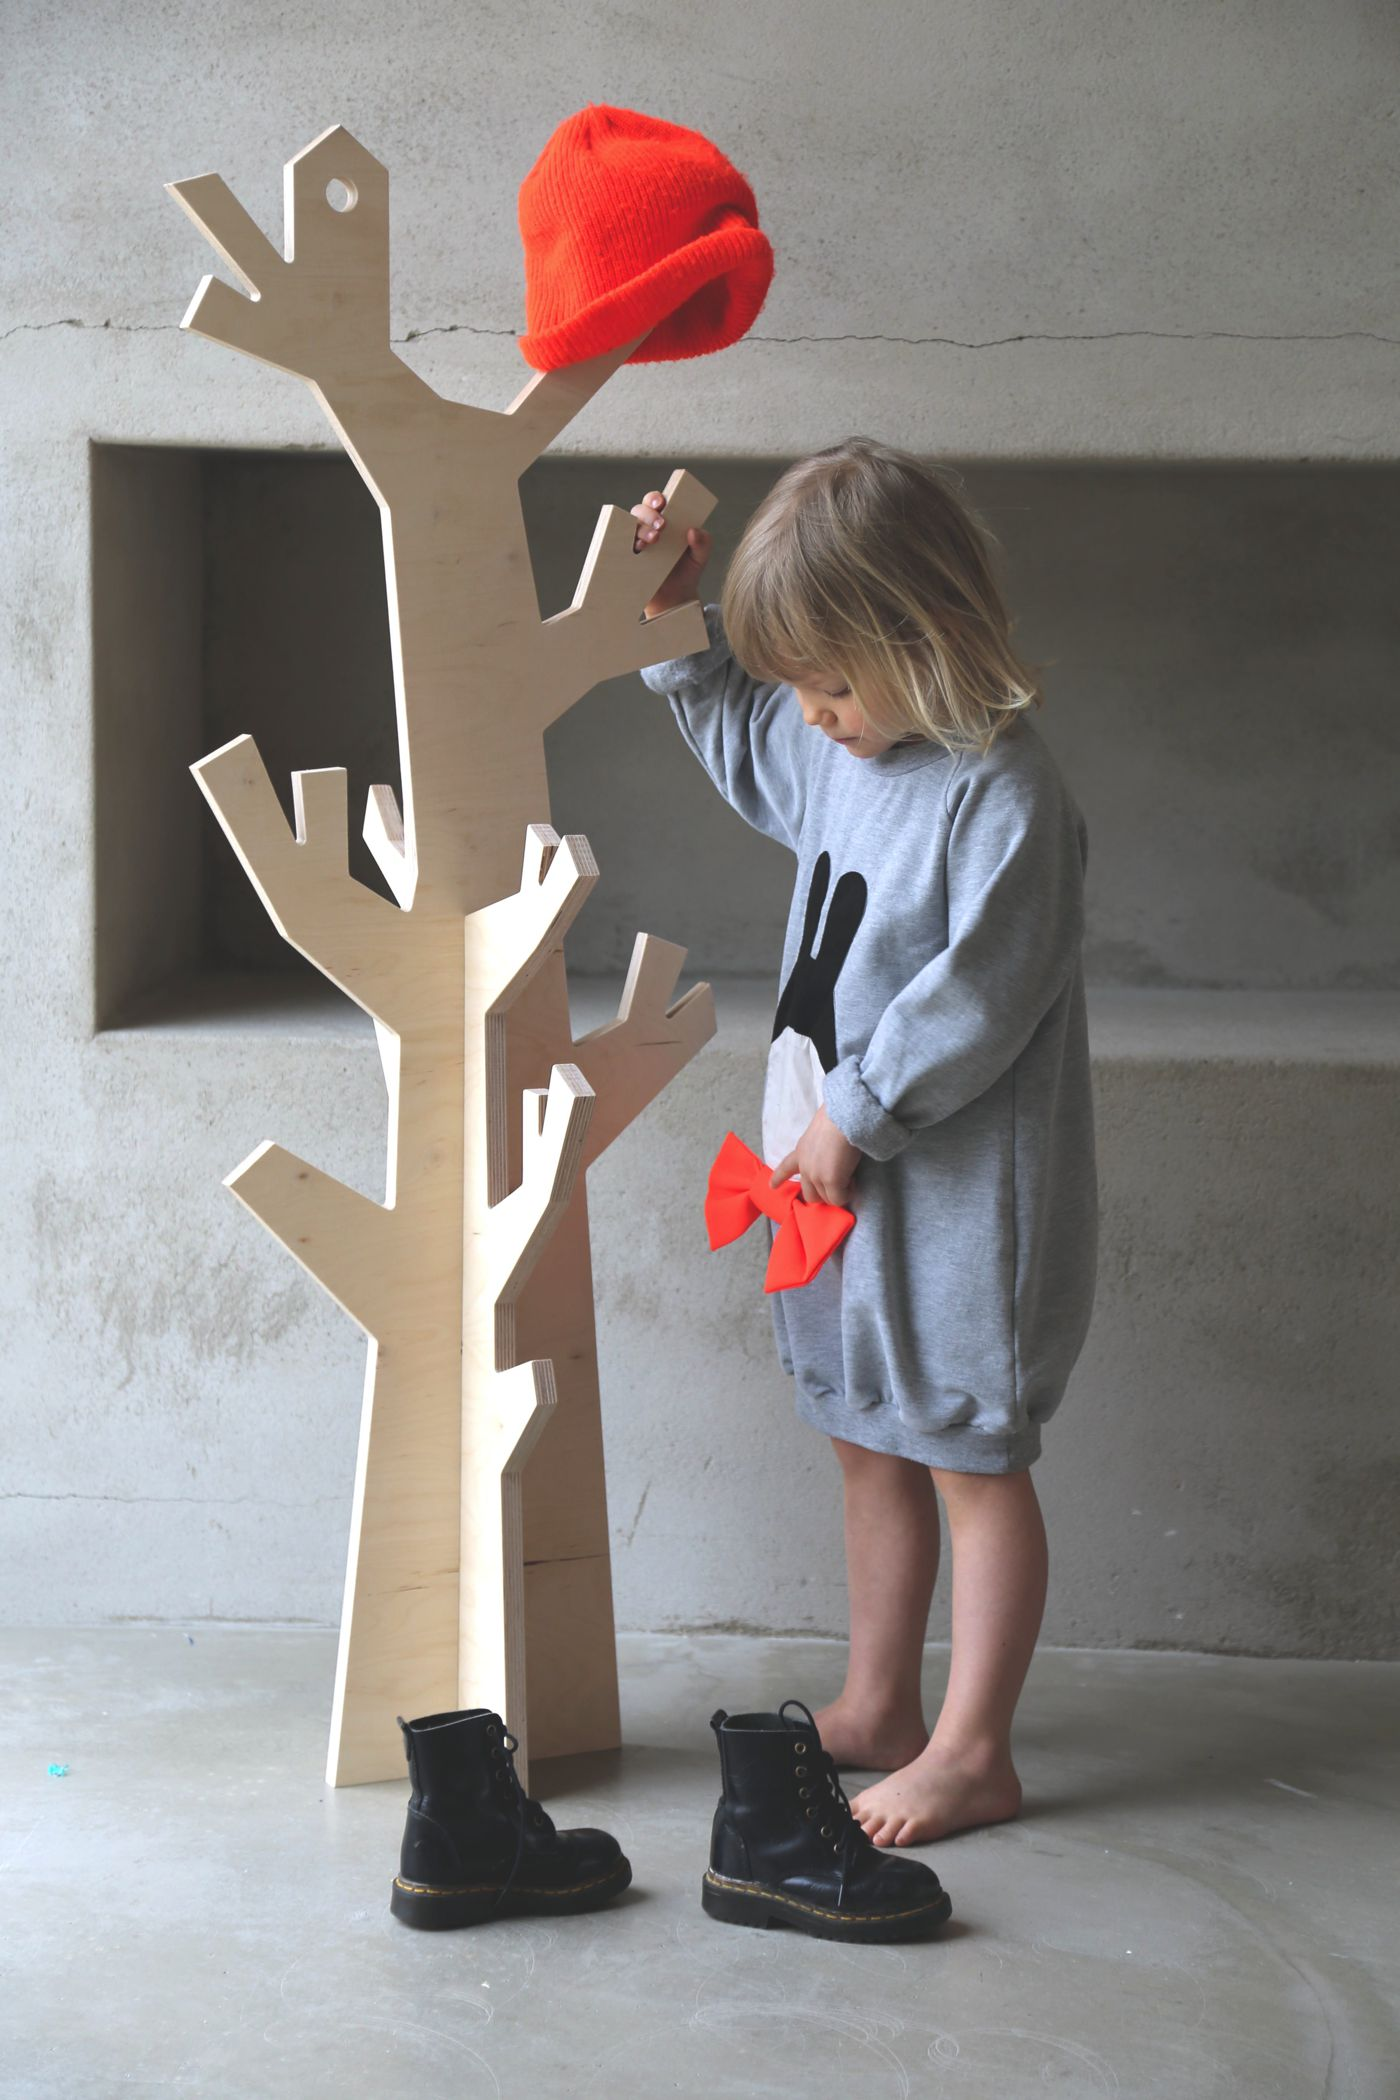 4 fantastically creative wooden shelves and racks (1)